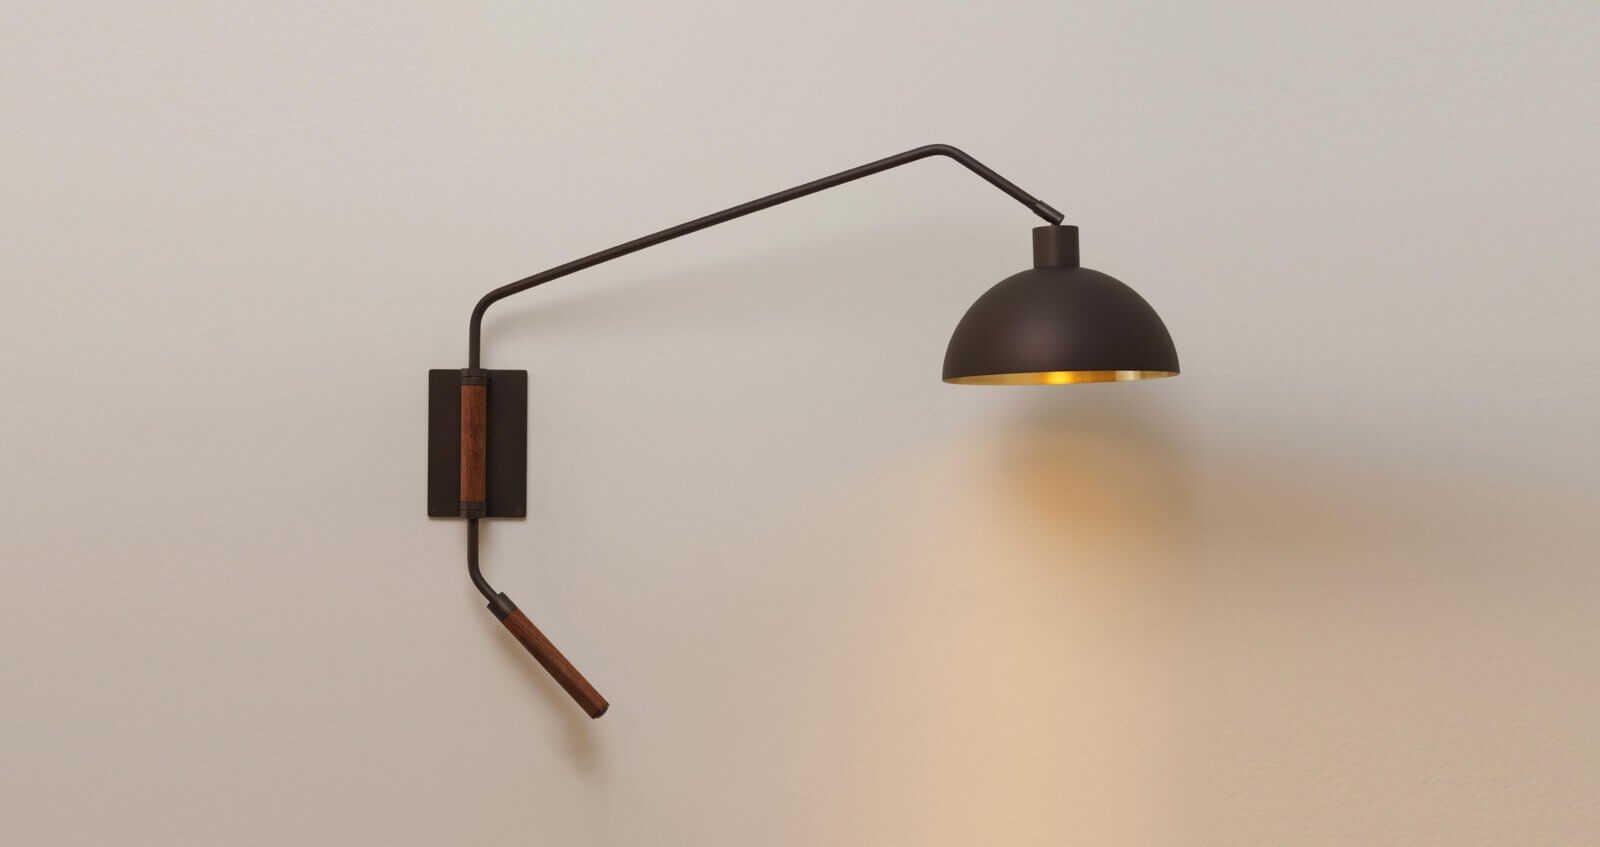 TinnappelMetz-allied-maker-arc-wall-lamp-04